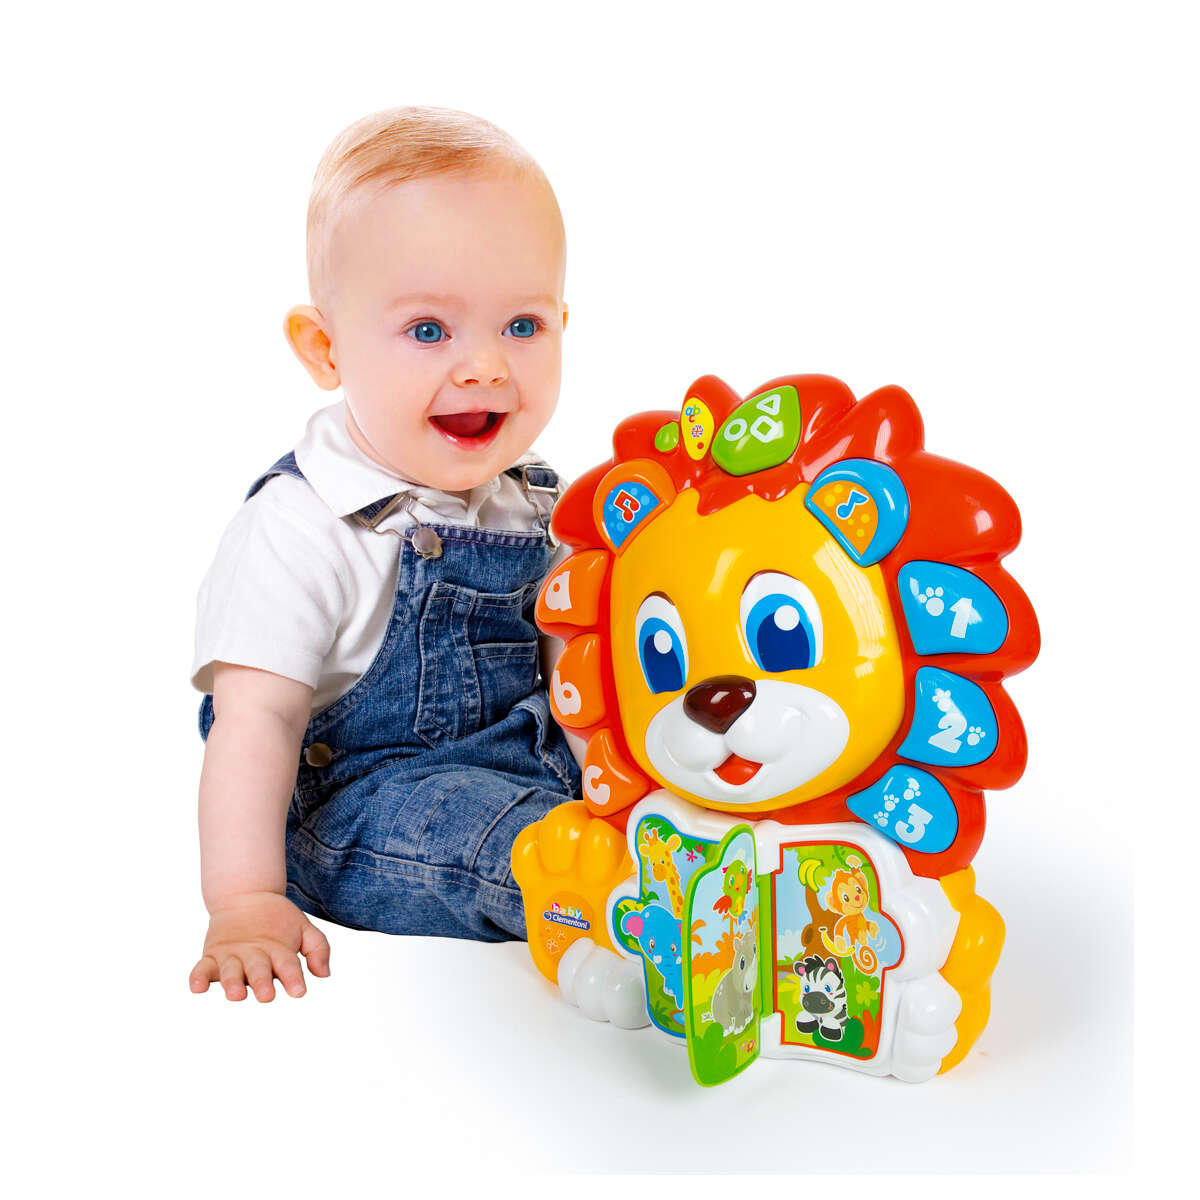 Baby Clementoni-ინტერაქტიული ლომი